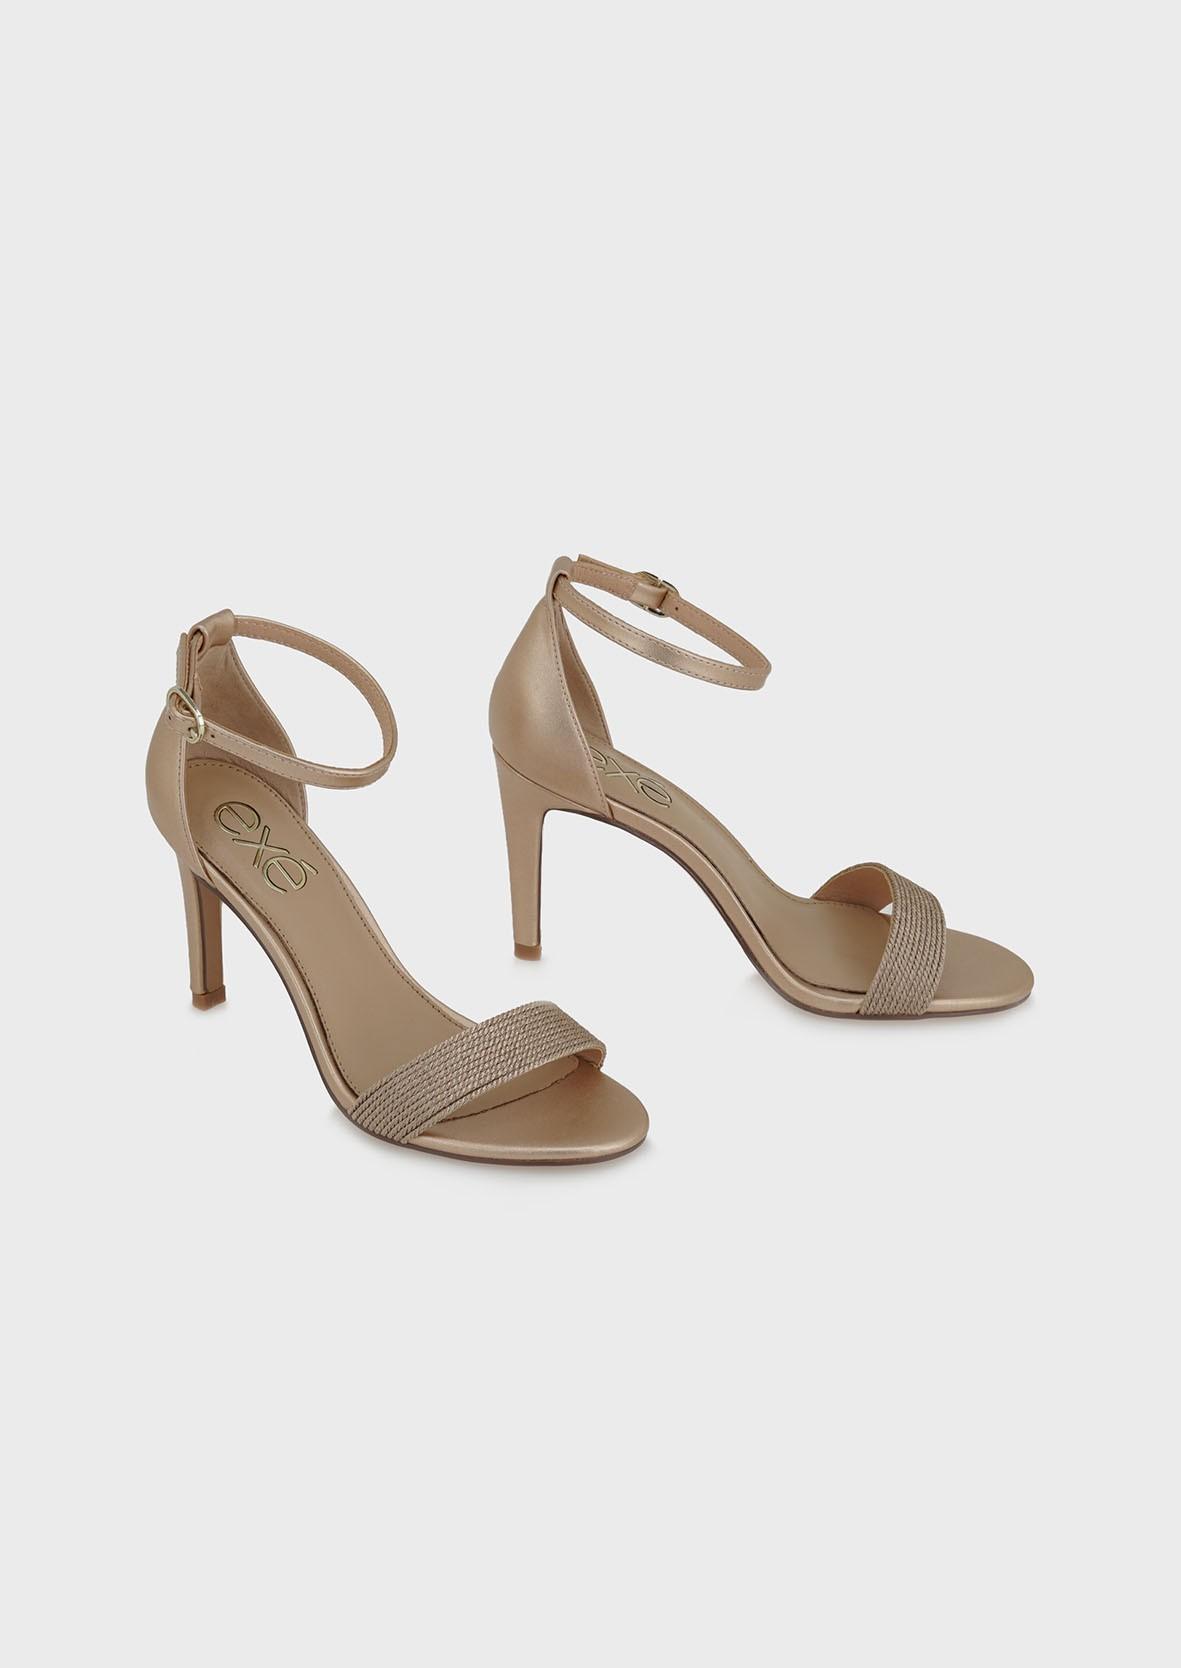 EXE Shoes Πέδιλα Γυναικεία REBECA-303 Ροζ Χρυσό M4700303519N